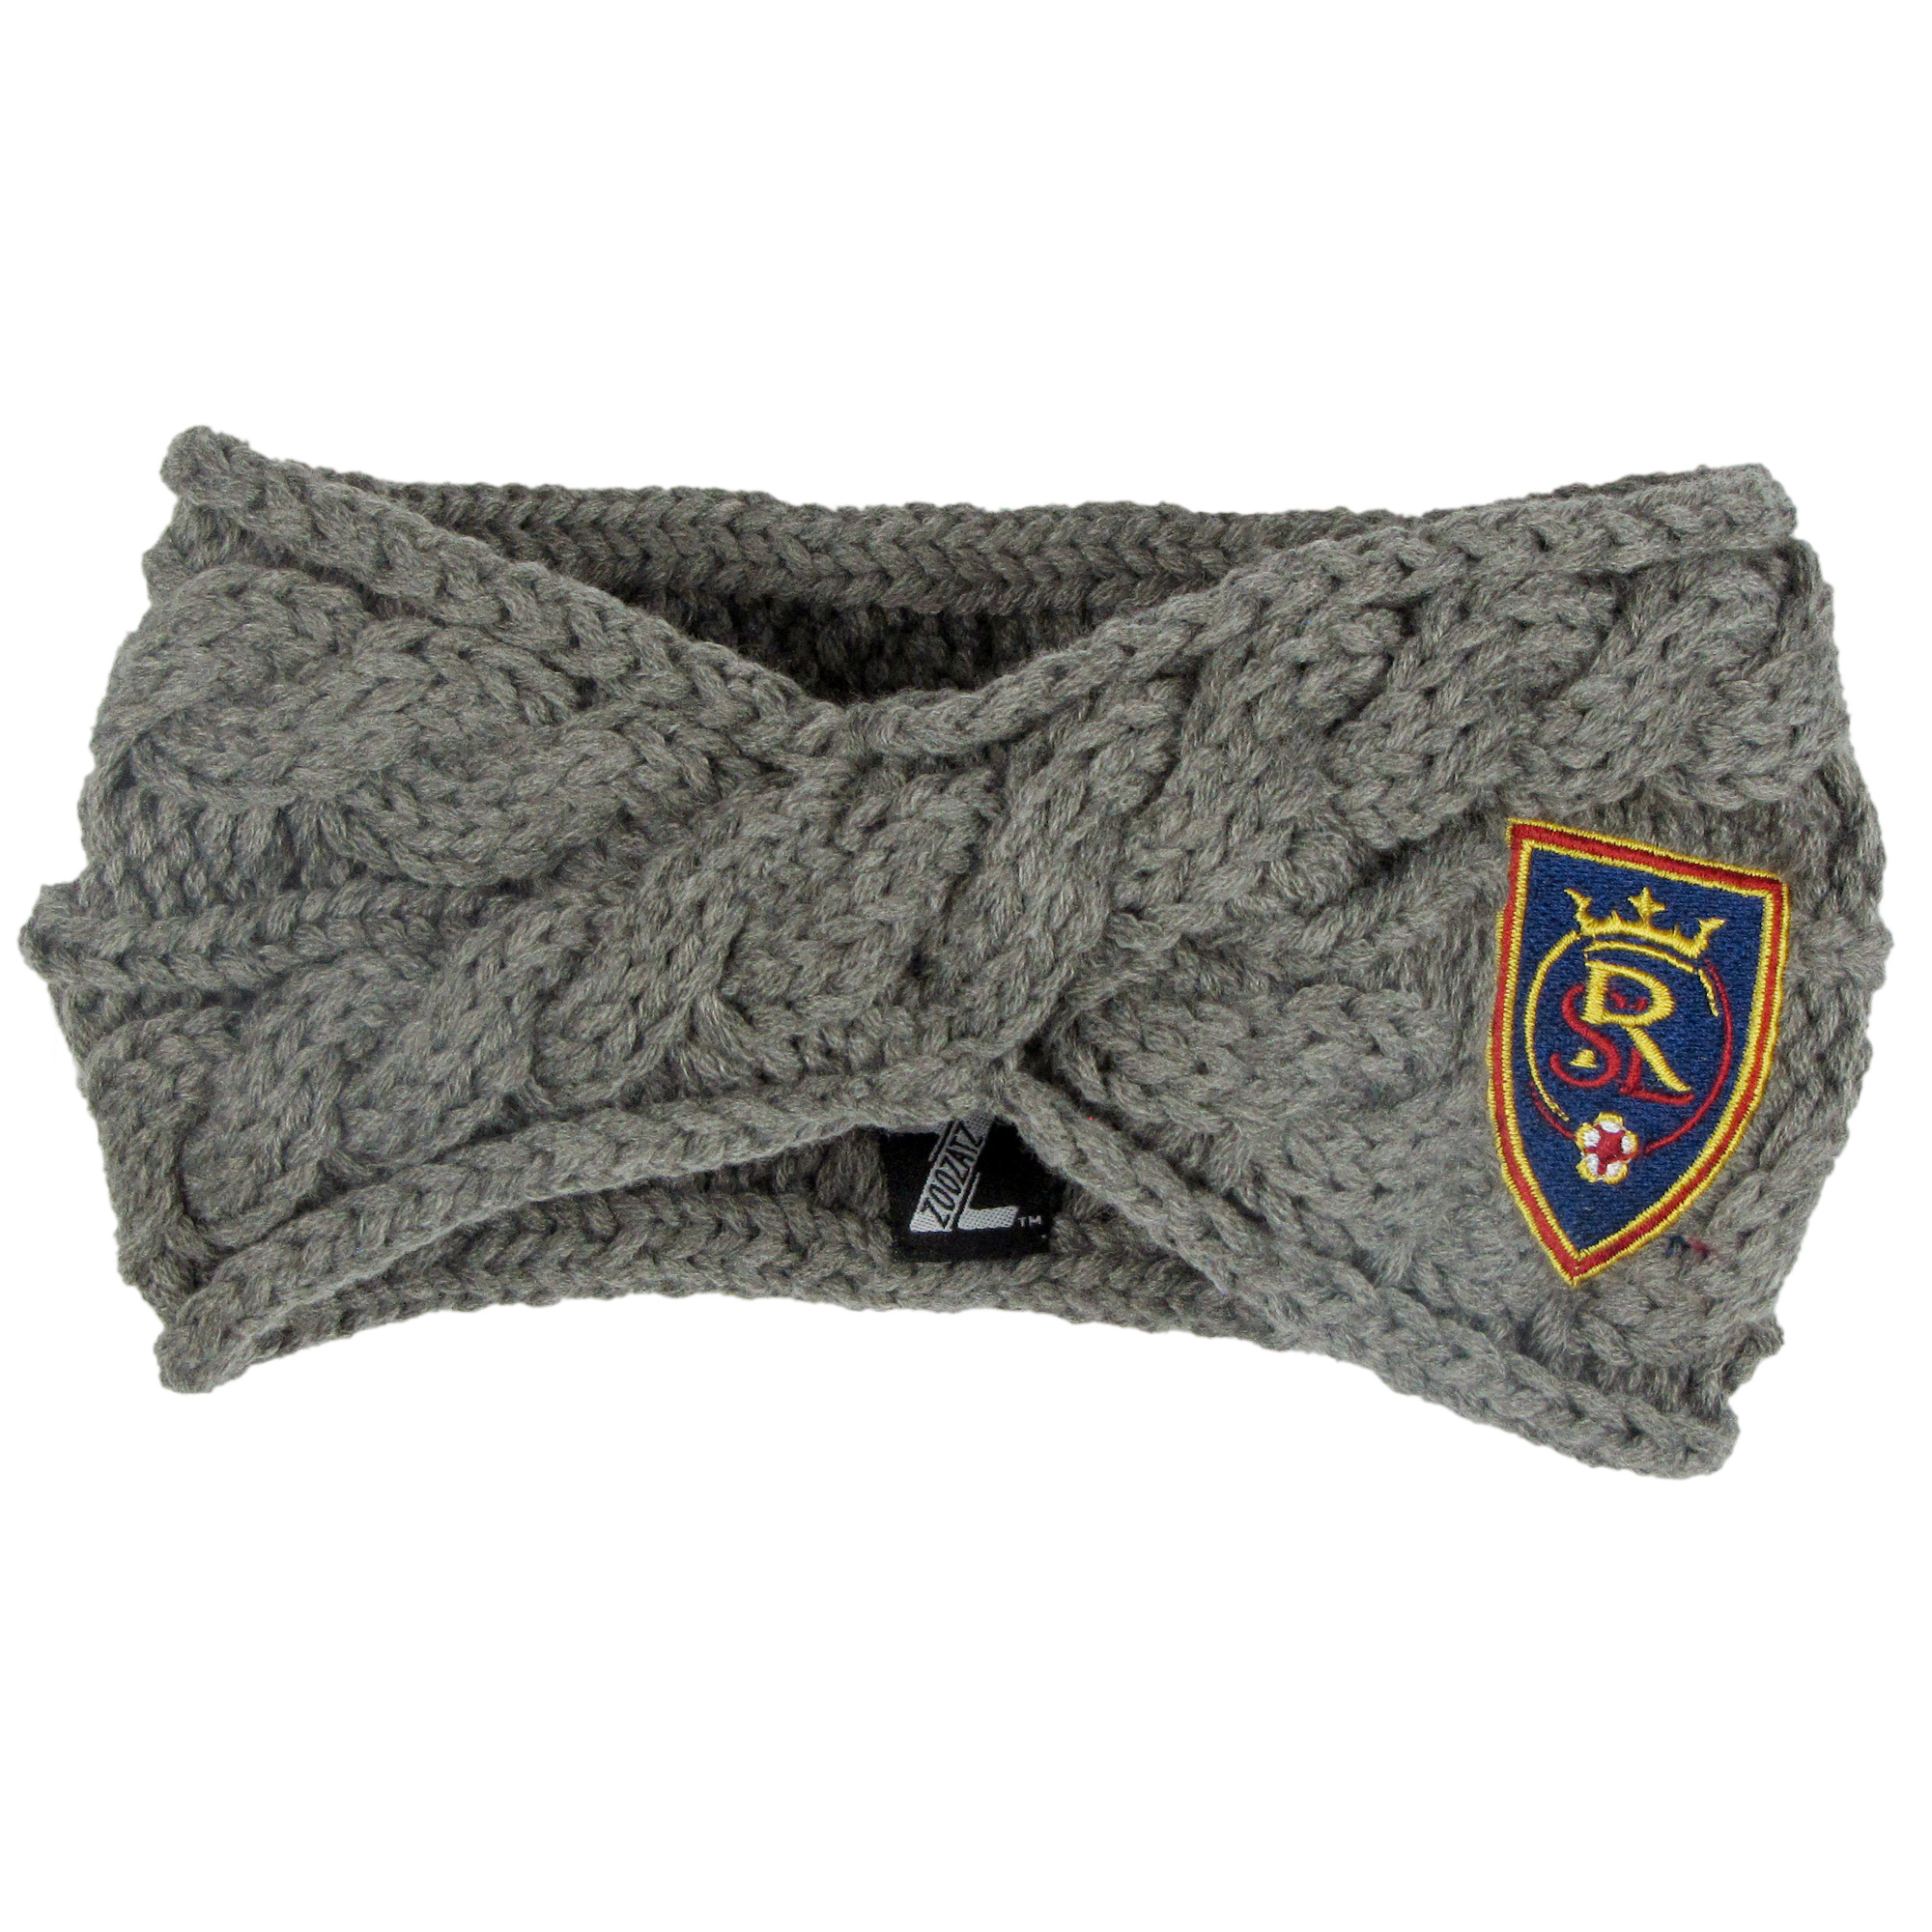 Real Salt Lake ZooZatz Women's Cable Headband - Charcoal - No Size